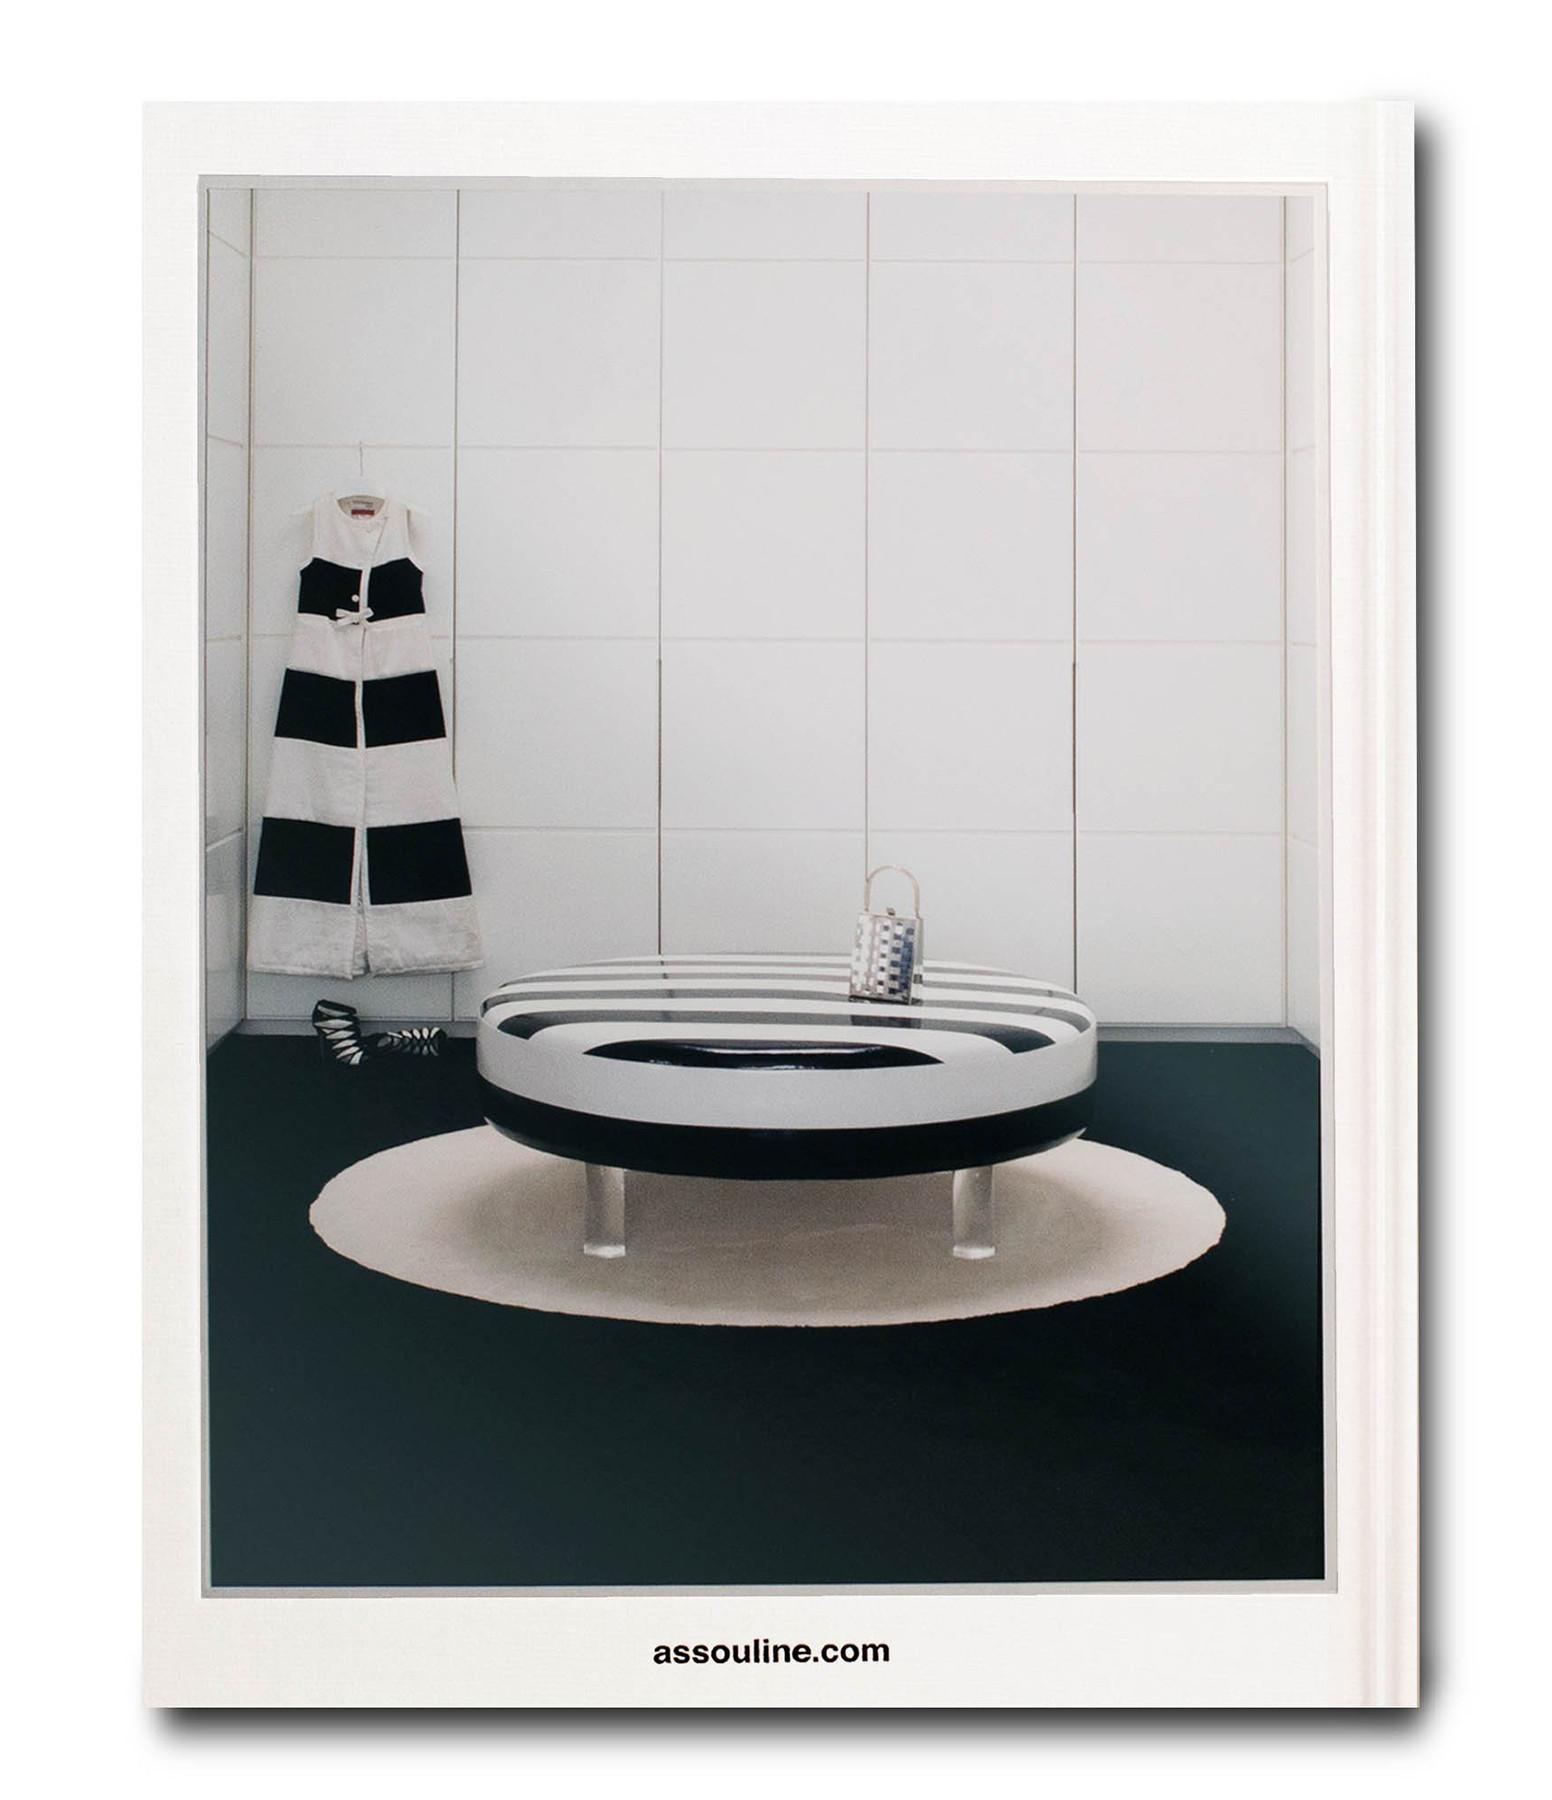 ASSOULINE - Livre Lisa Perry : Fashion, Homes, Design